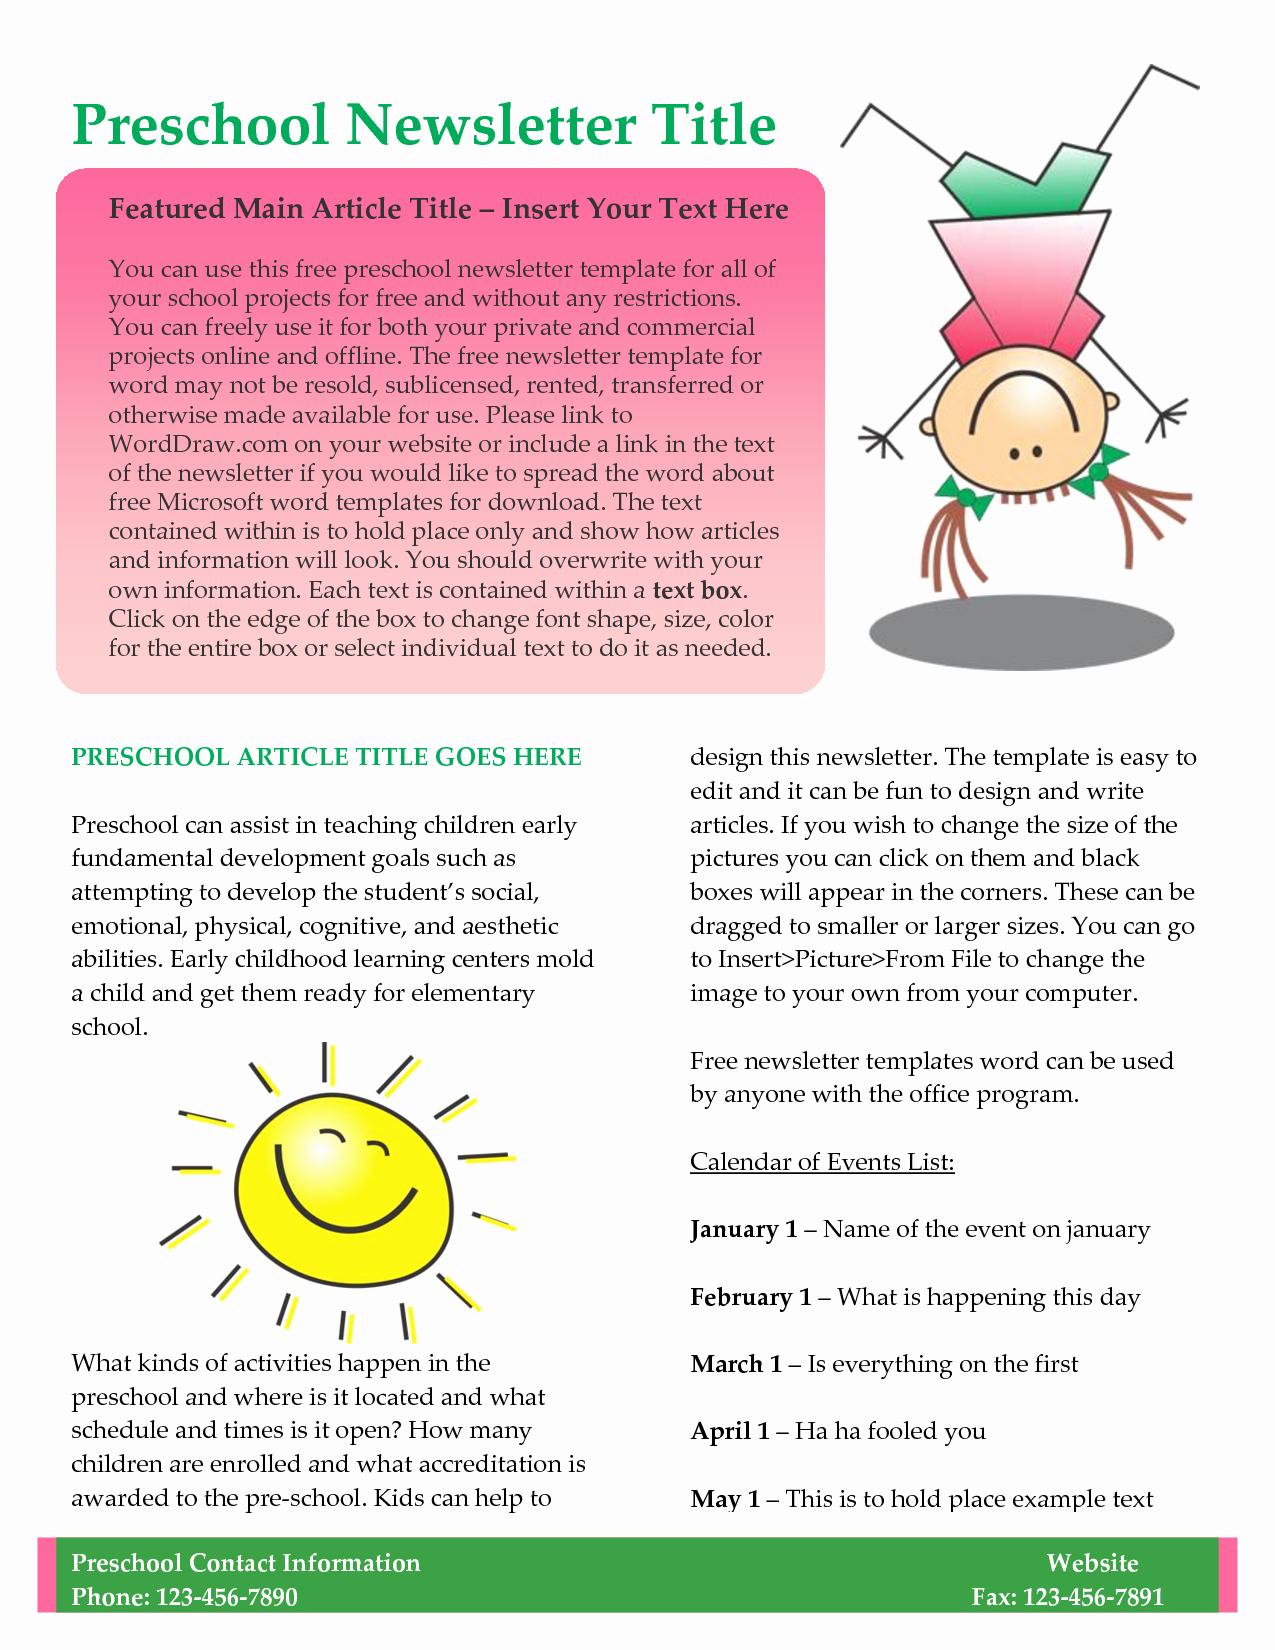 Newsletter Template for Preschool Inspirational Preschool Newsletter Template